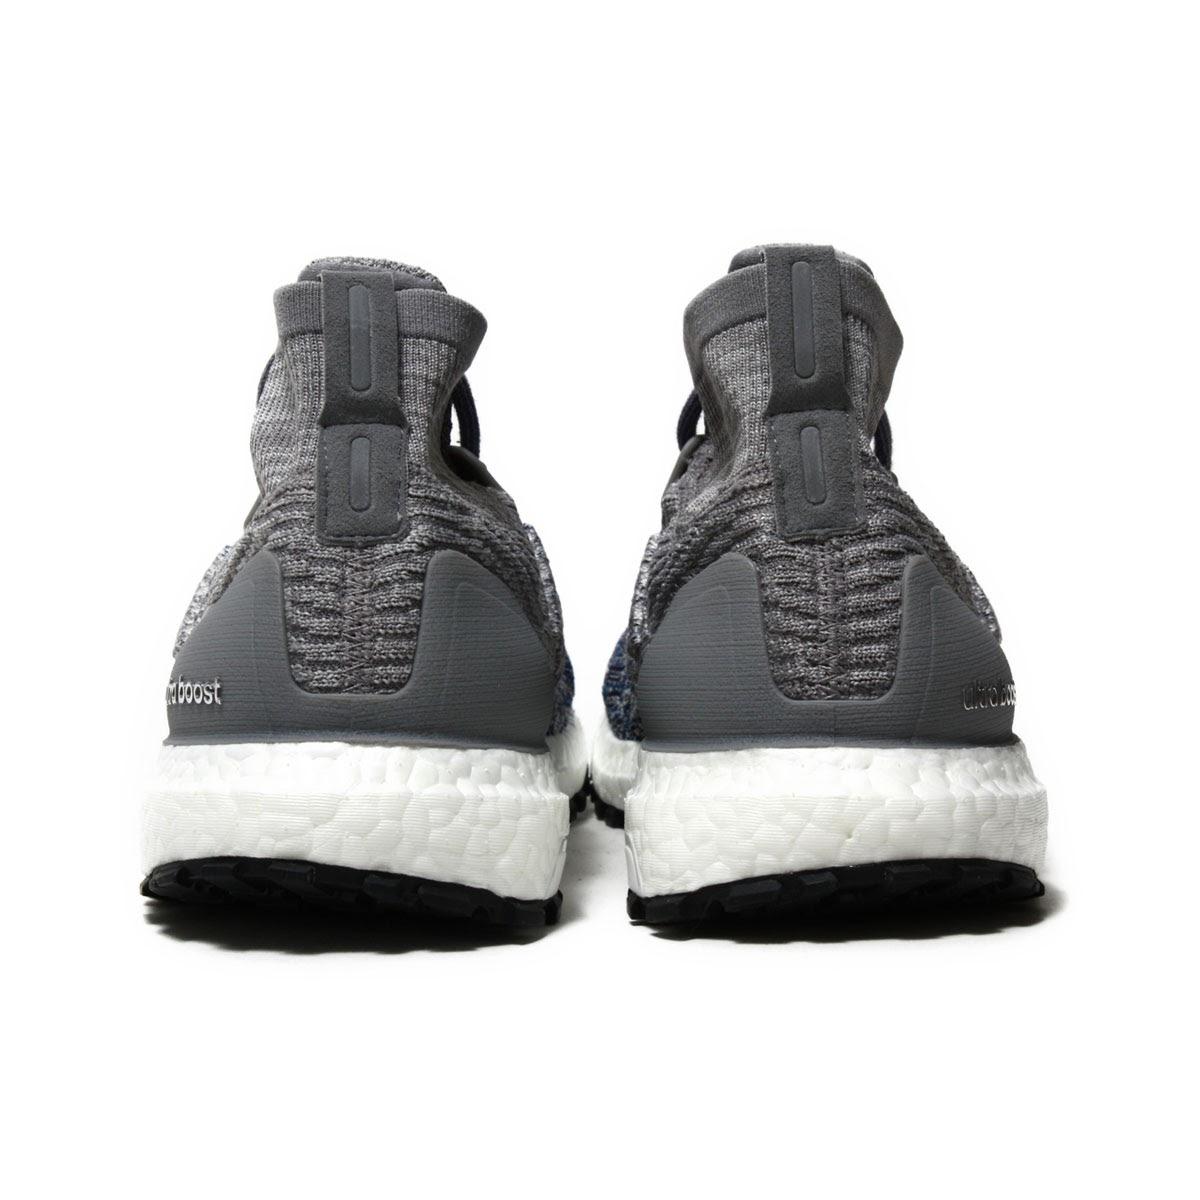 adidas Originals UltraBOOST All Terrain (enter the Adidas originals ultra boost oar terra) (GreyGreyNoble Indigo)